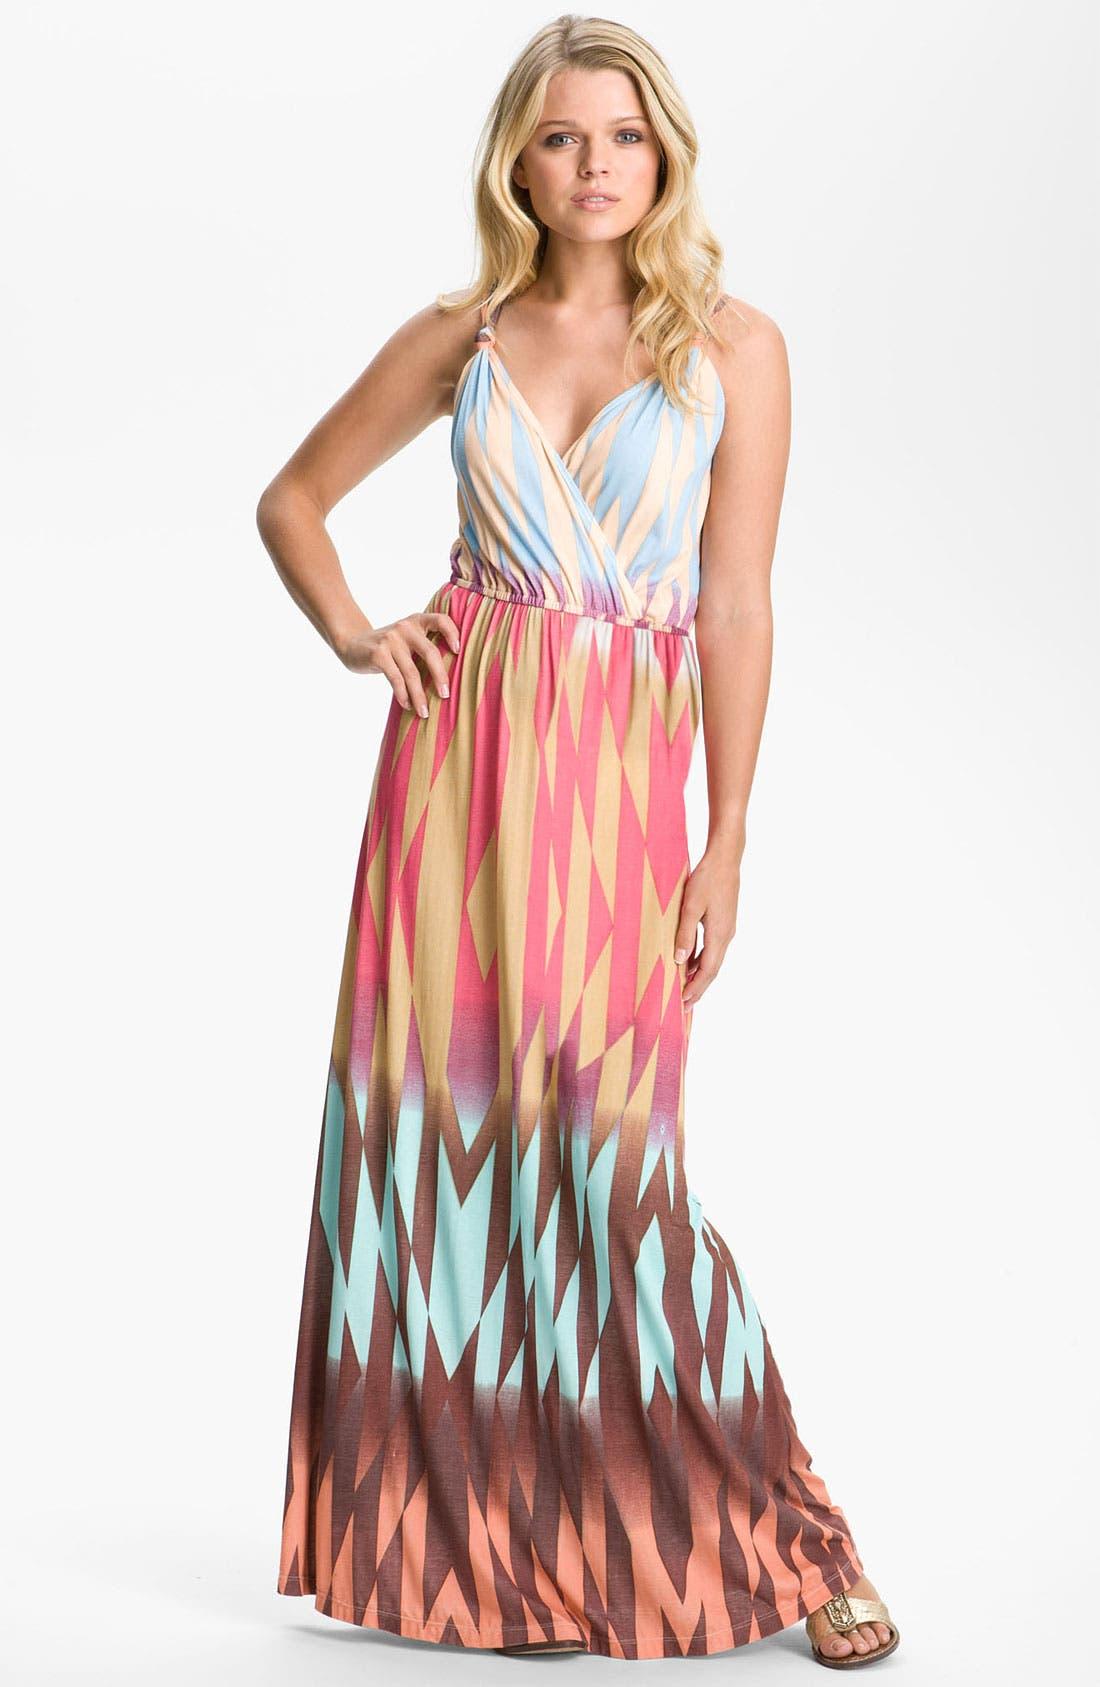 Alternate Image 1 Selected - Presley Skye Print Surplice Jersey Maxi Dress